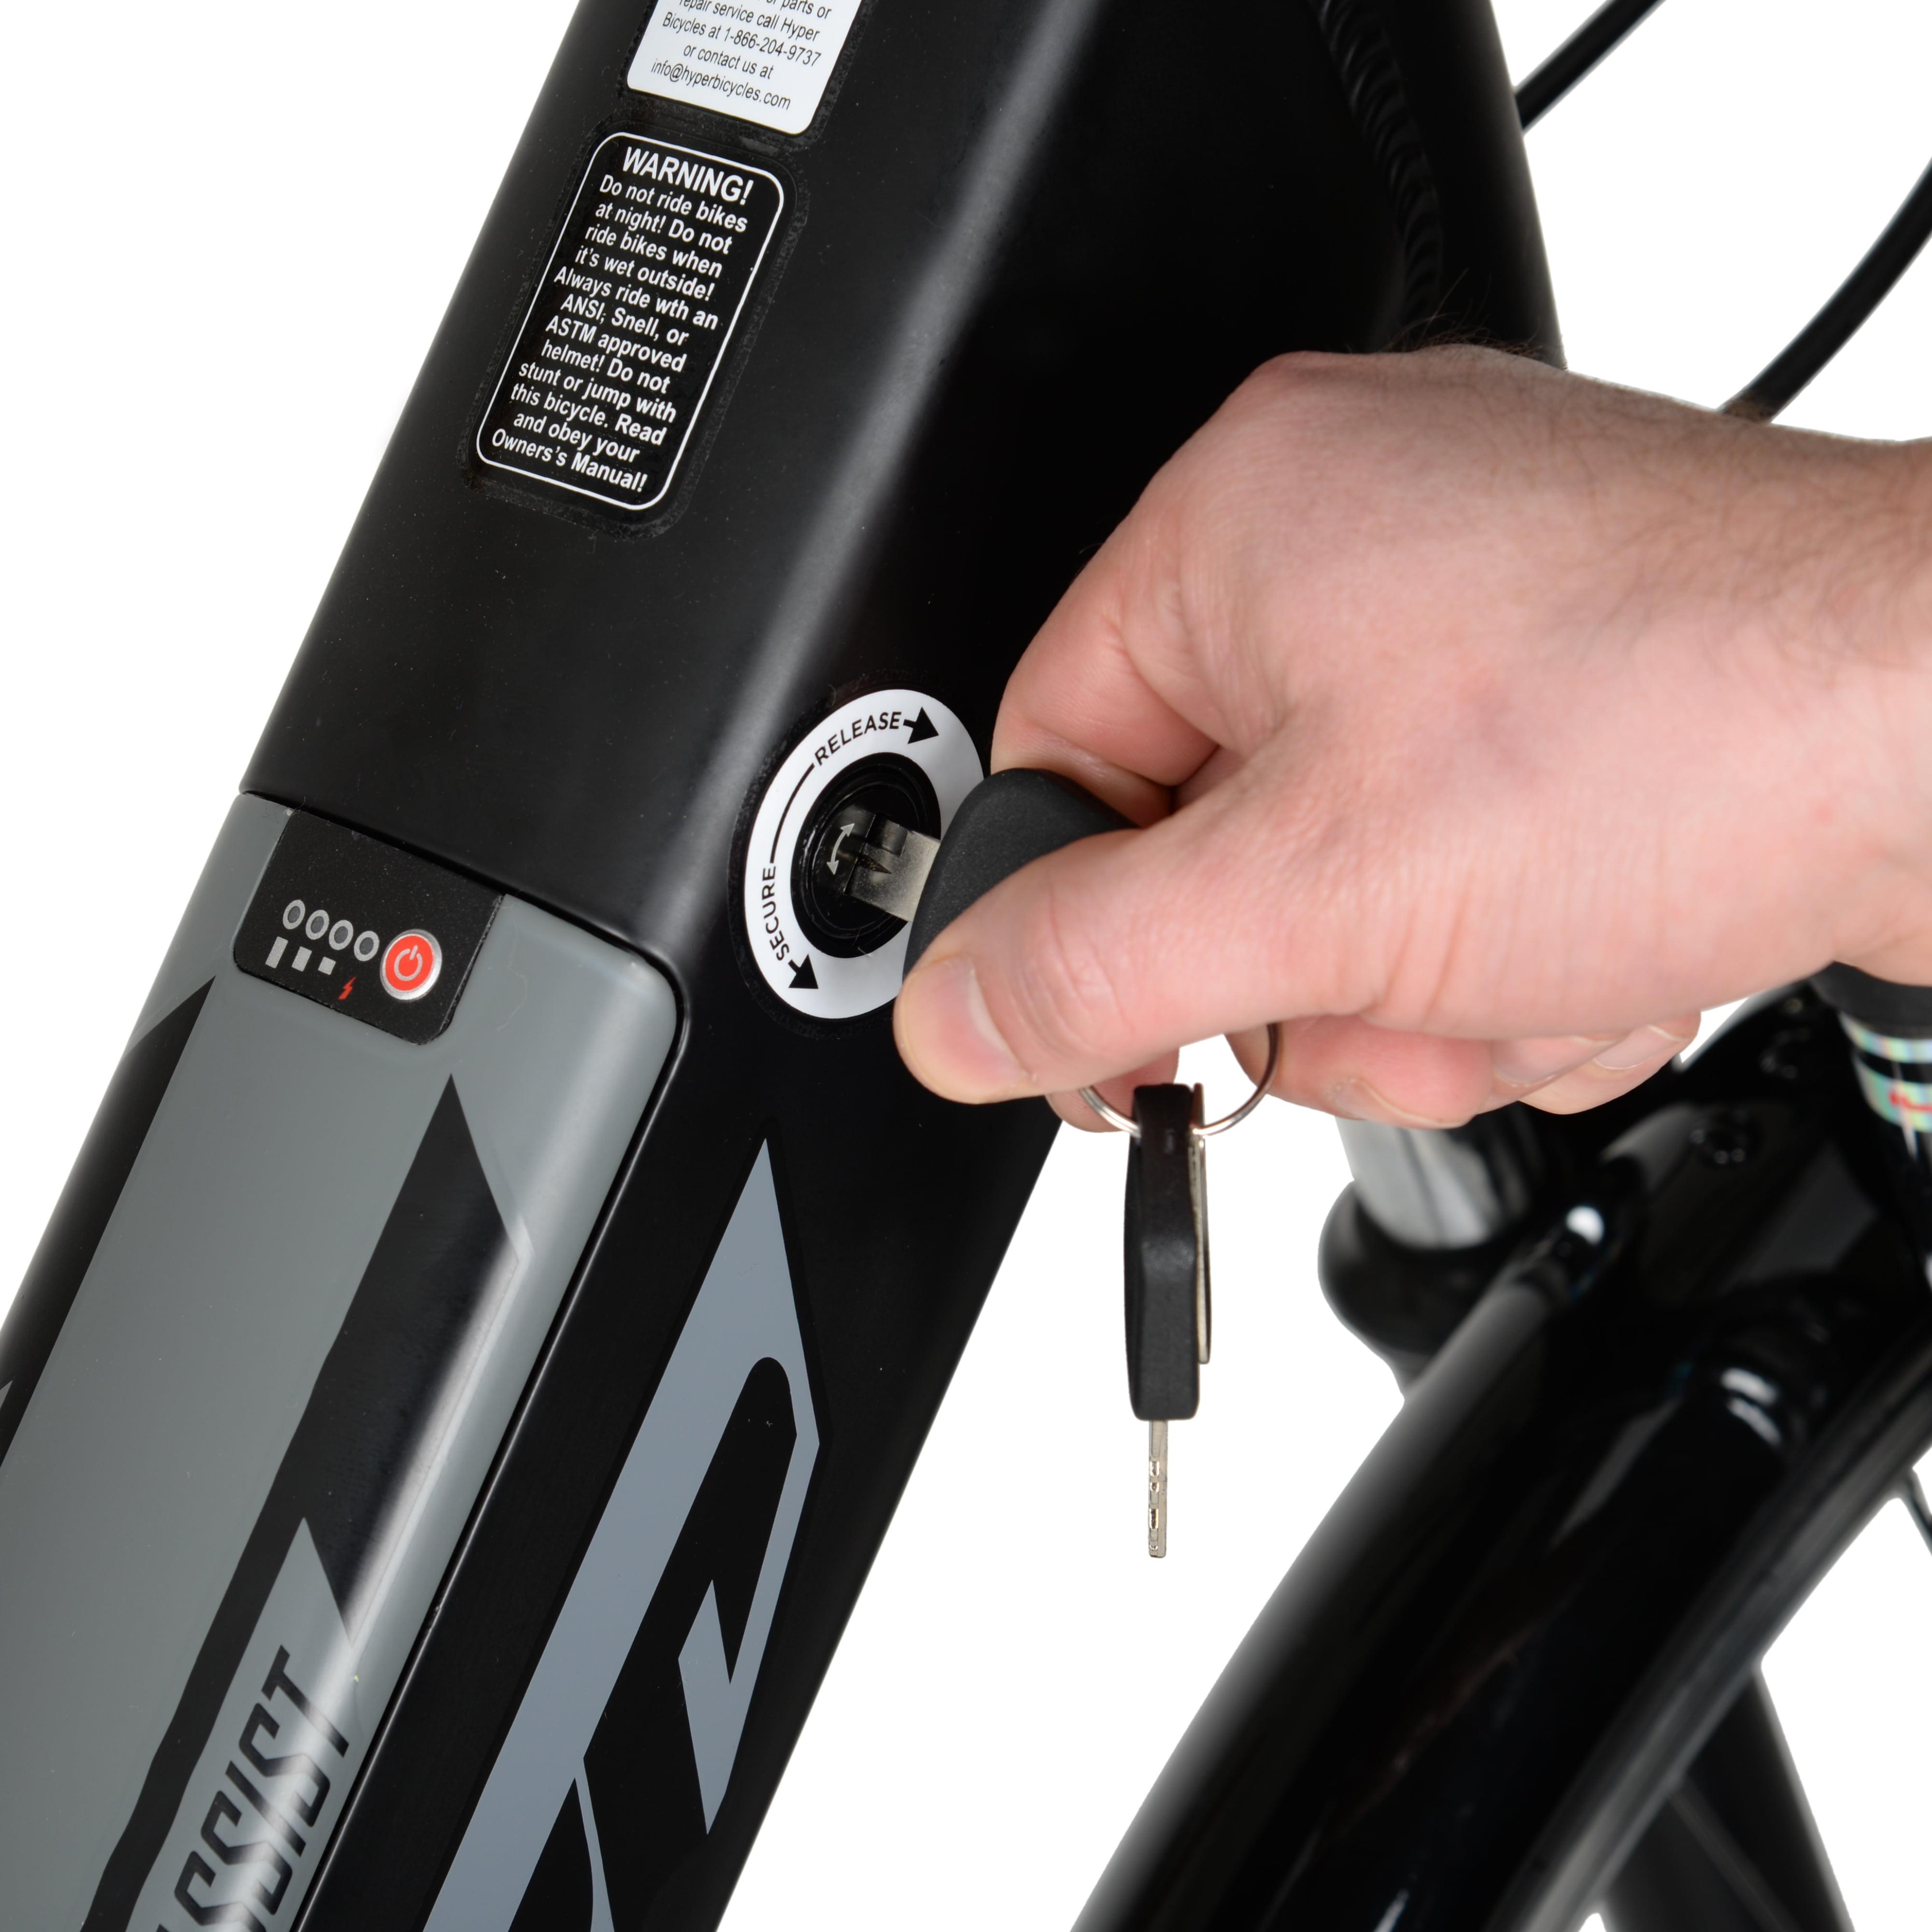 Hyper E-Ride Electric Bike 700C Wheels, 36 Volt Battery, 20+